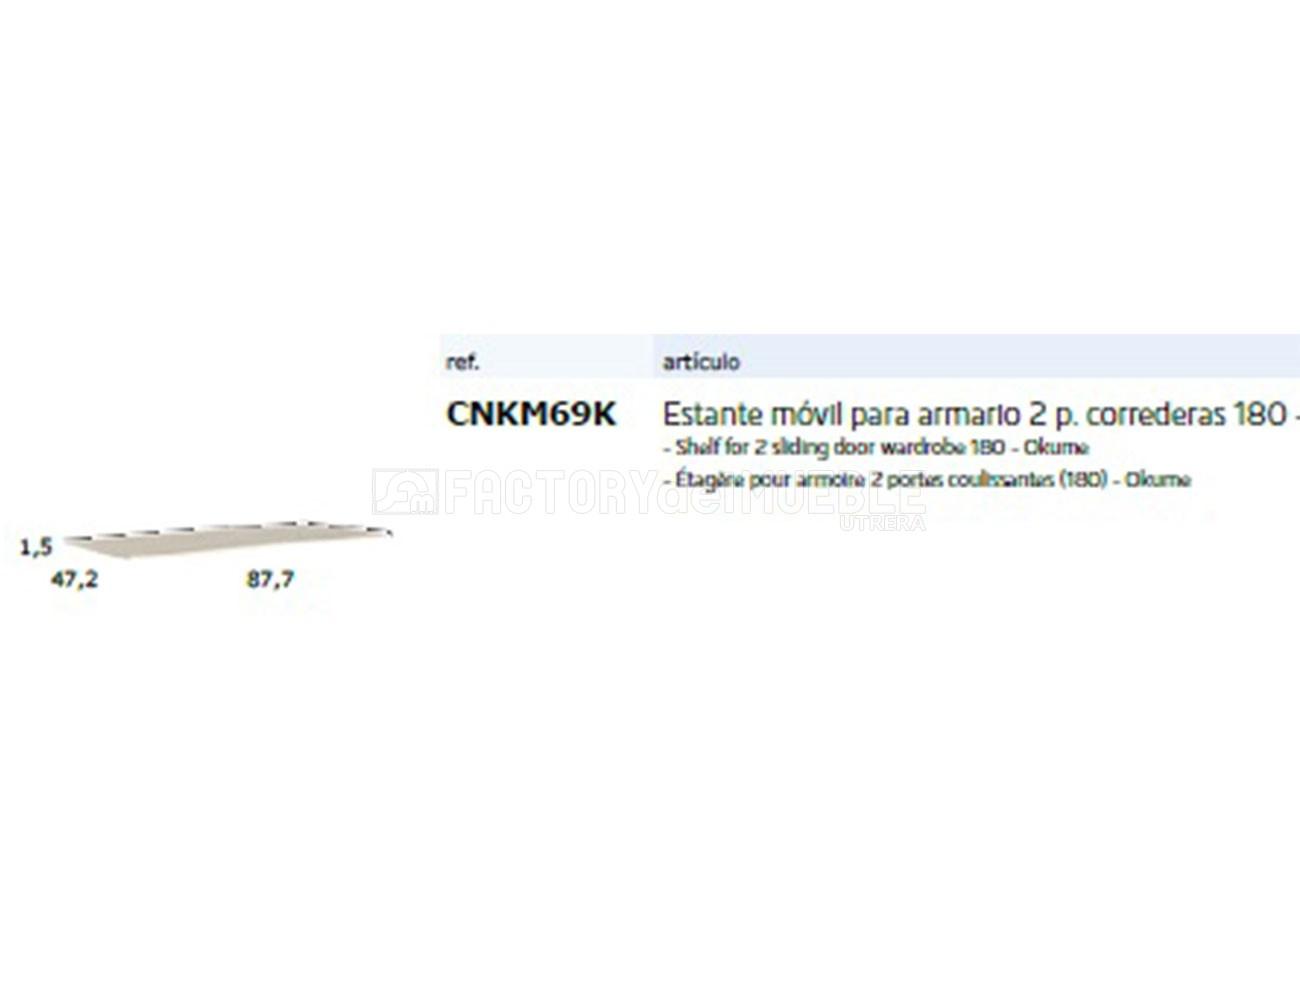 Cnkm69k estante movil para armario 2p correderas 180